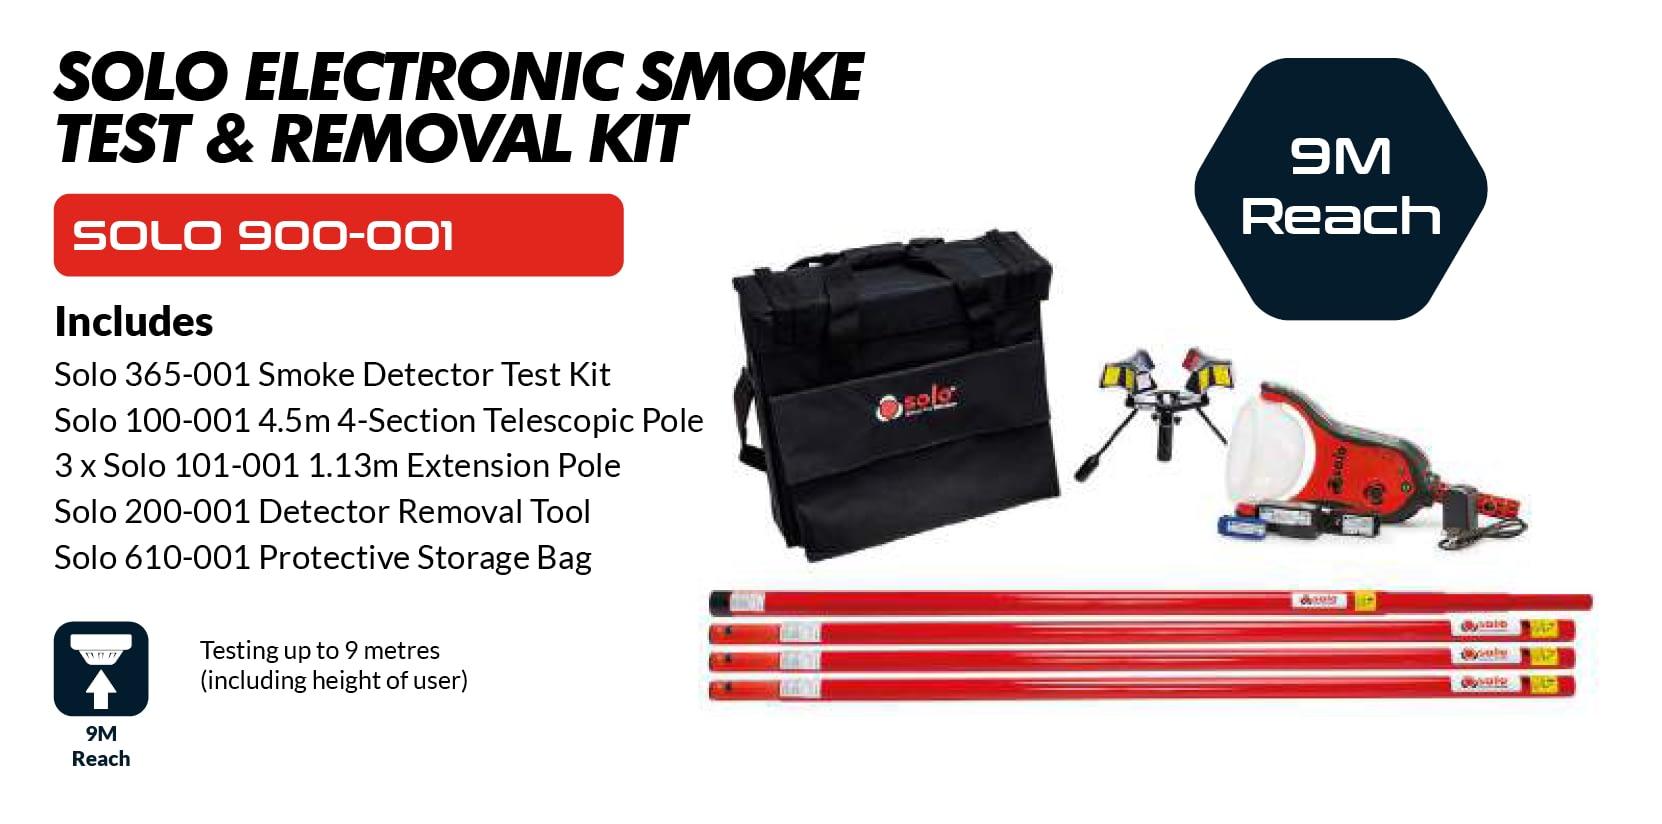 solo-detector-testers-testifire-no-climb-900-electronics-365-smoke-detector-test-kit-singapore